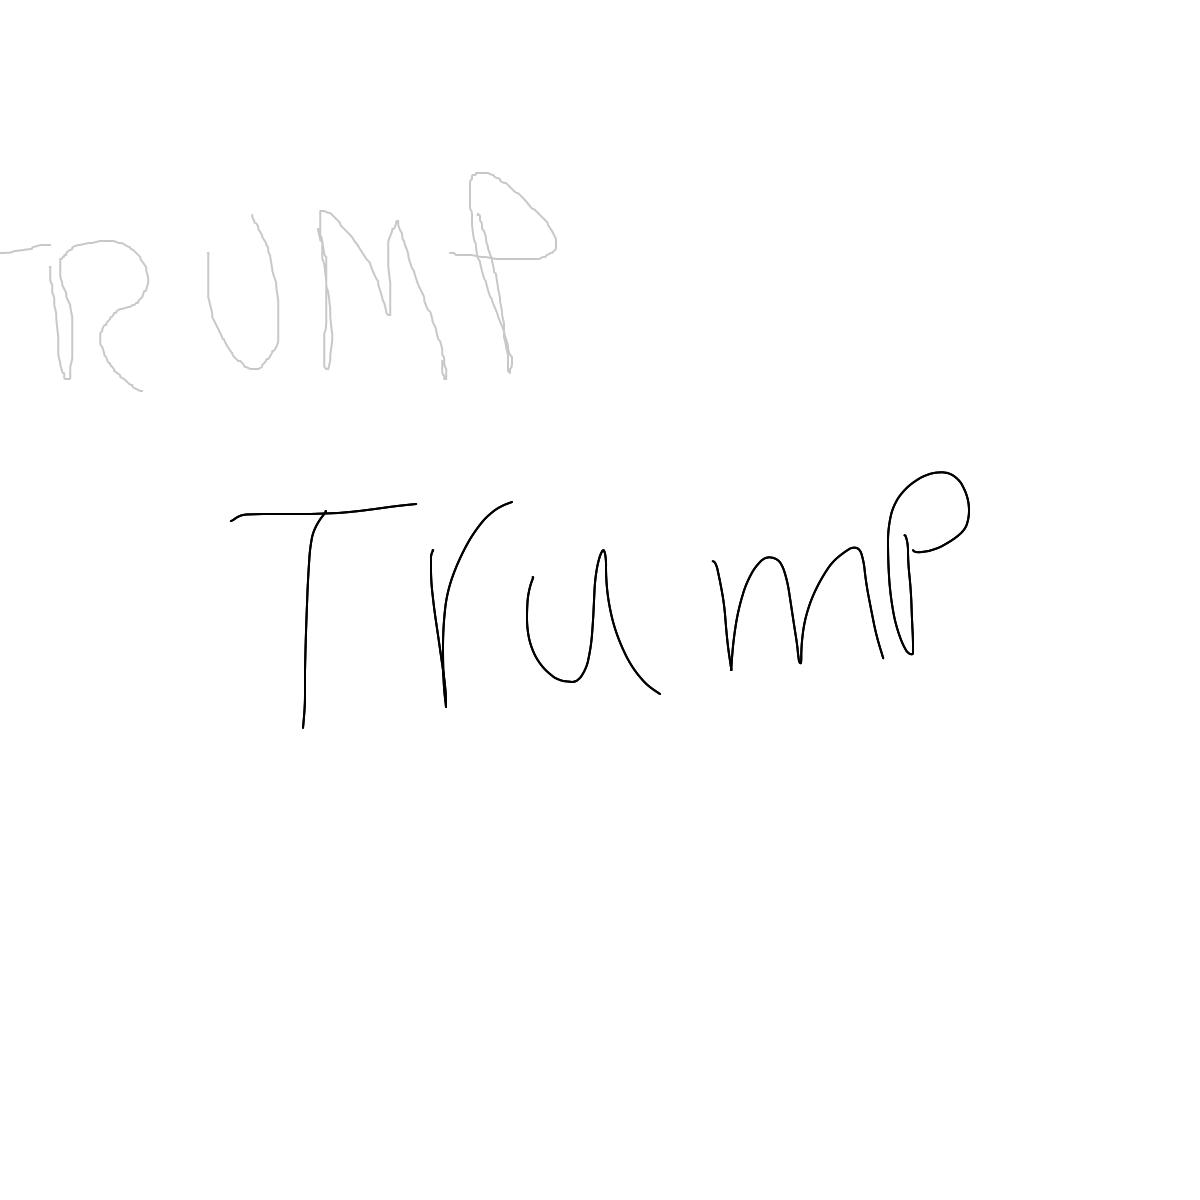 BAAAM drawing#23740 lat:38.8977012634277340lng: -77.0364913940429700